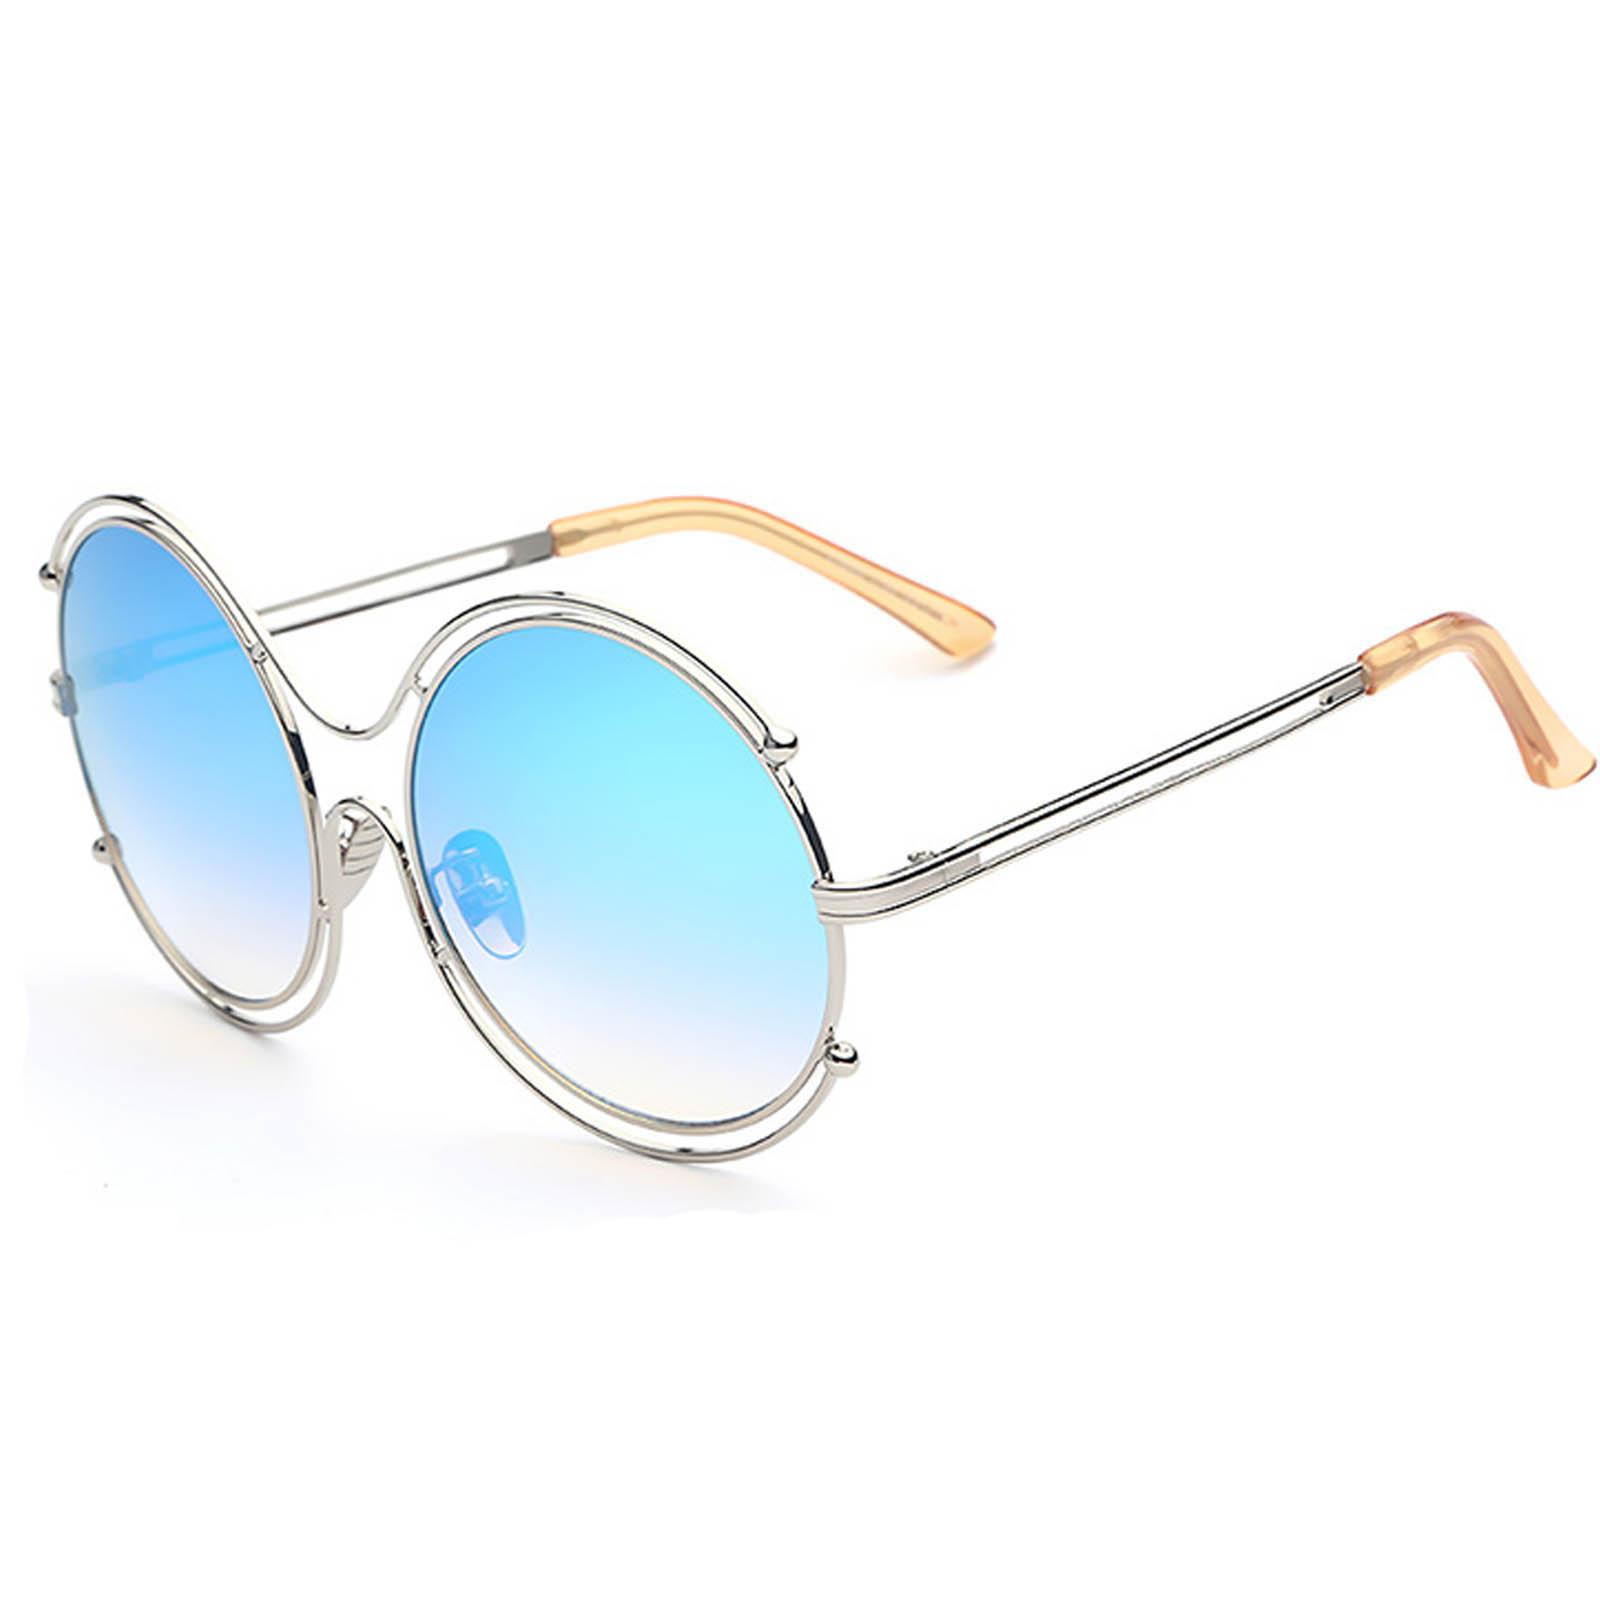 30b69a252a OWL ® 025 C3 Round Eyewear Sunglasses Women s Men s Metal Round Circle  Silver Frame Blue Mirror